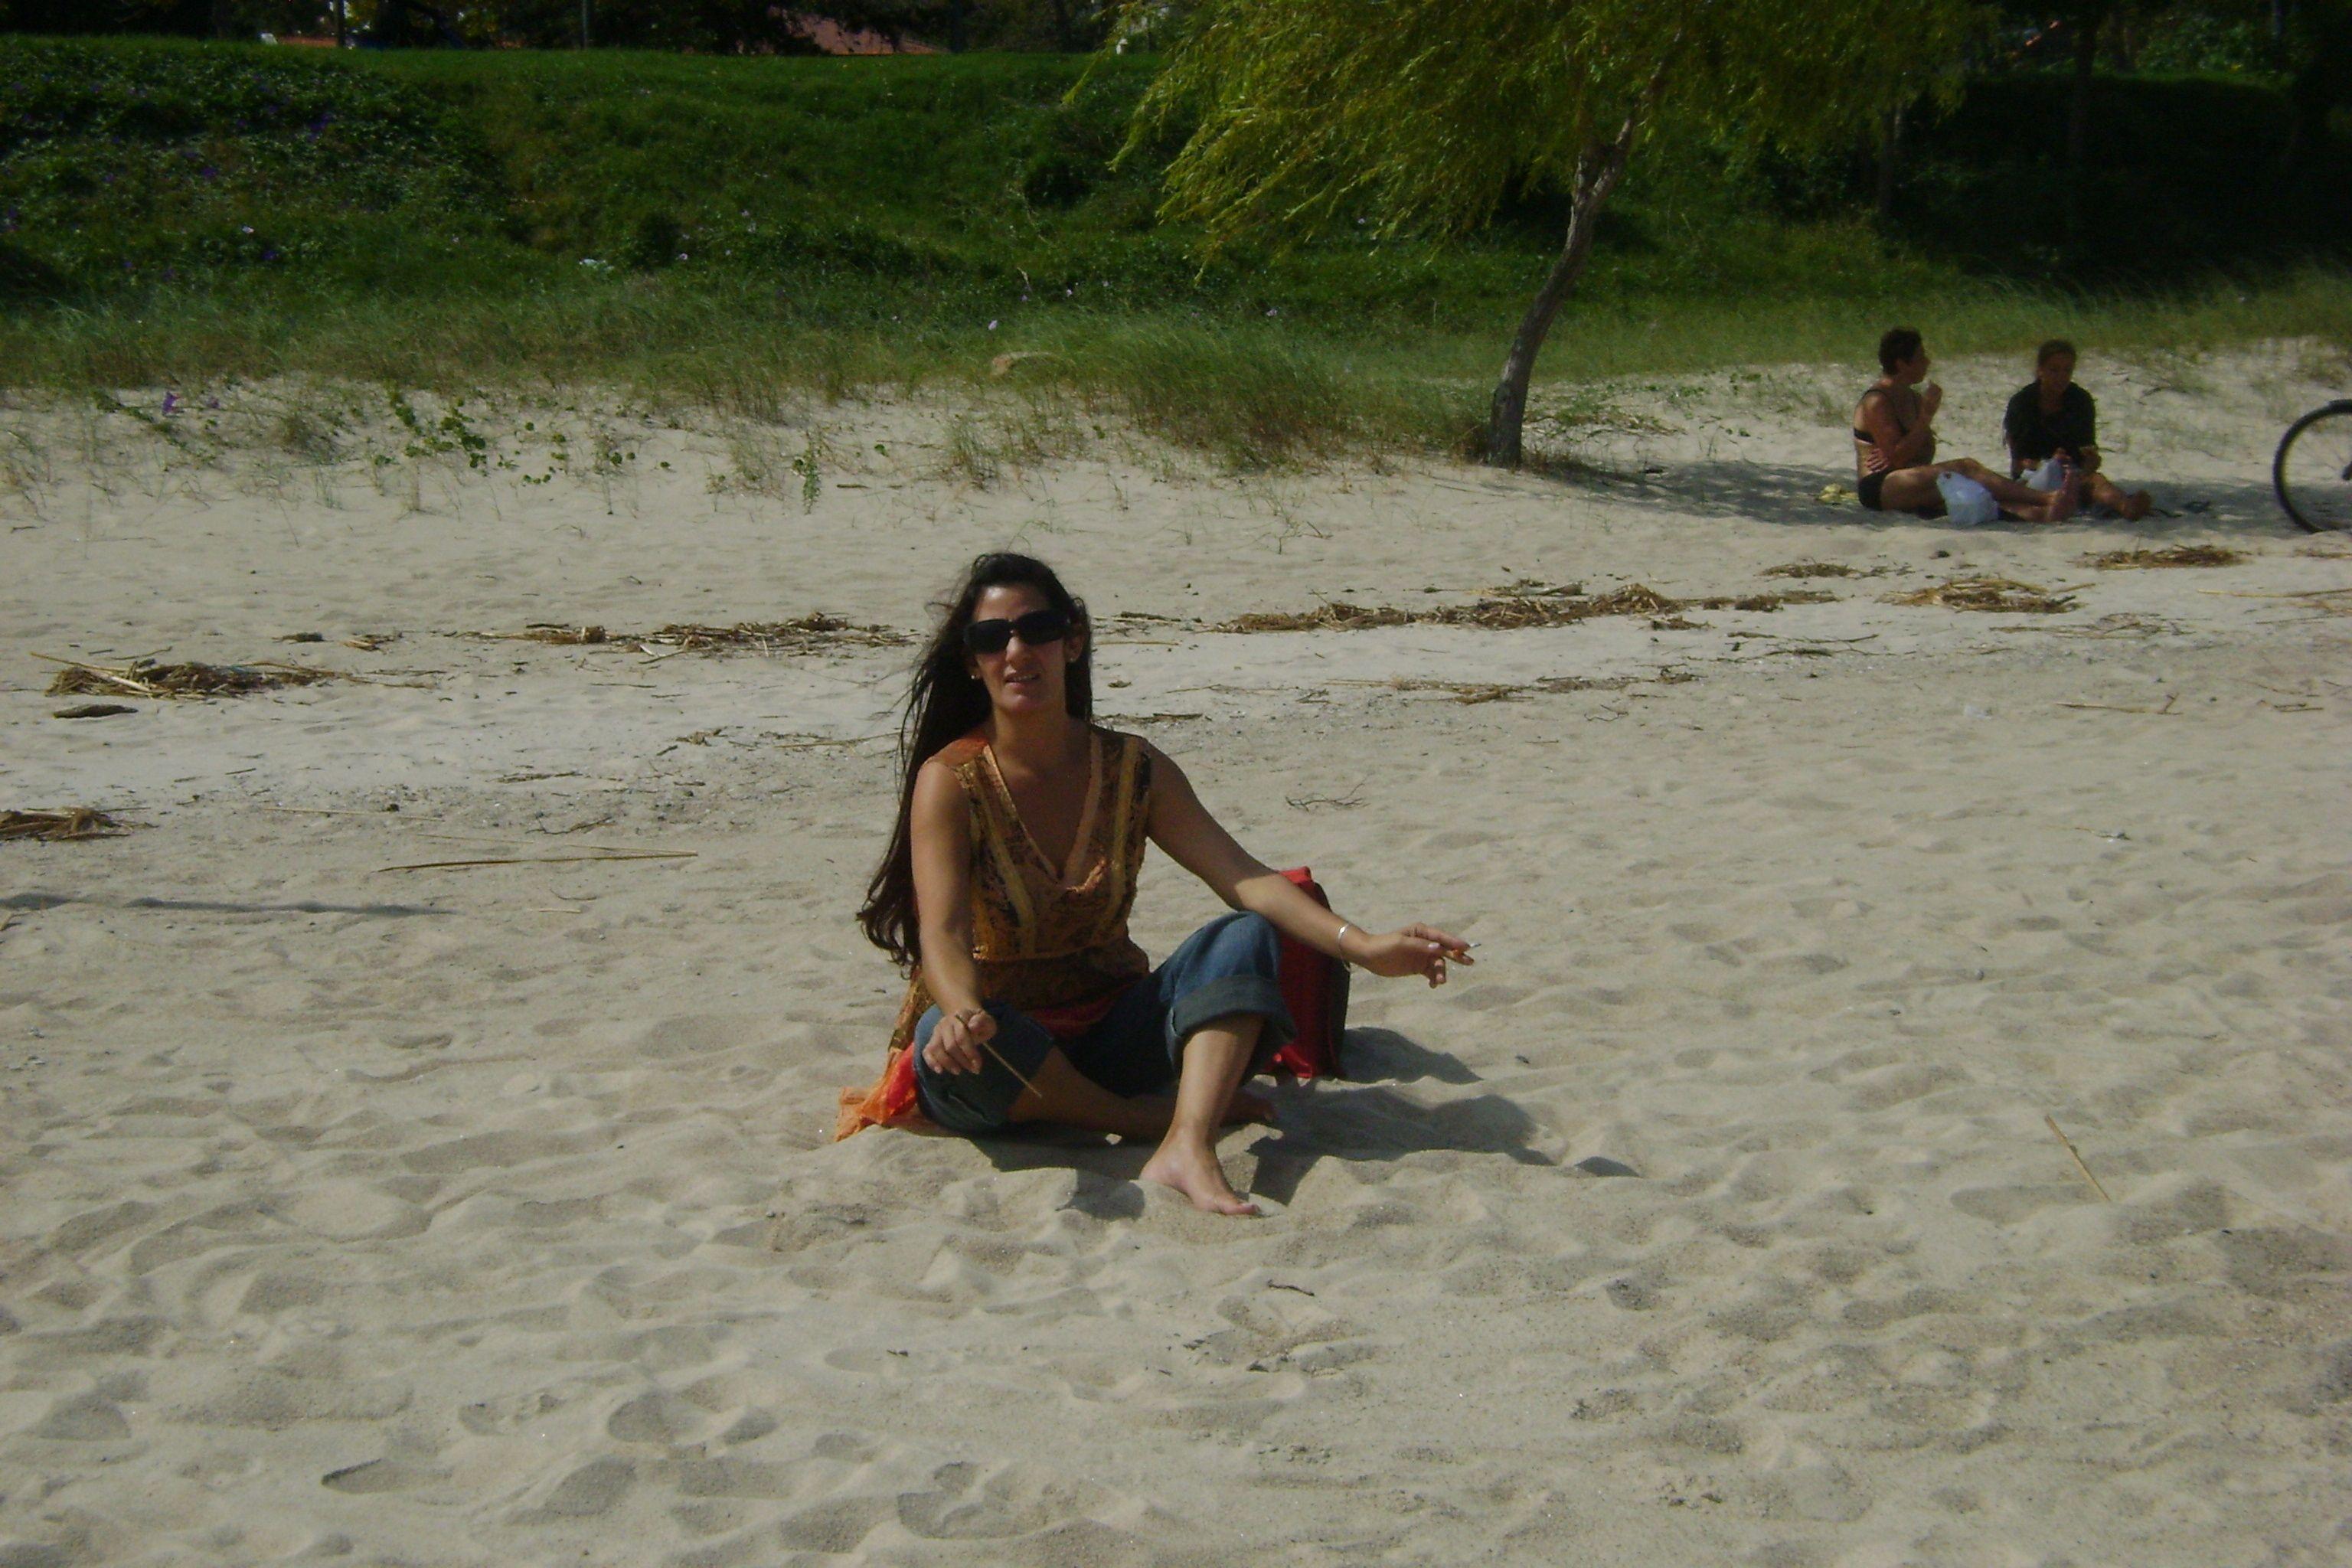 Playa. Arroyos (49)